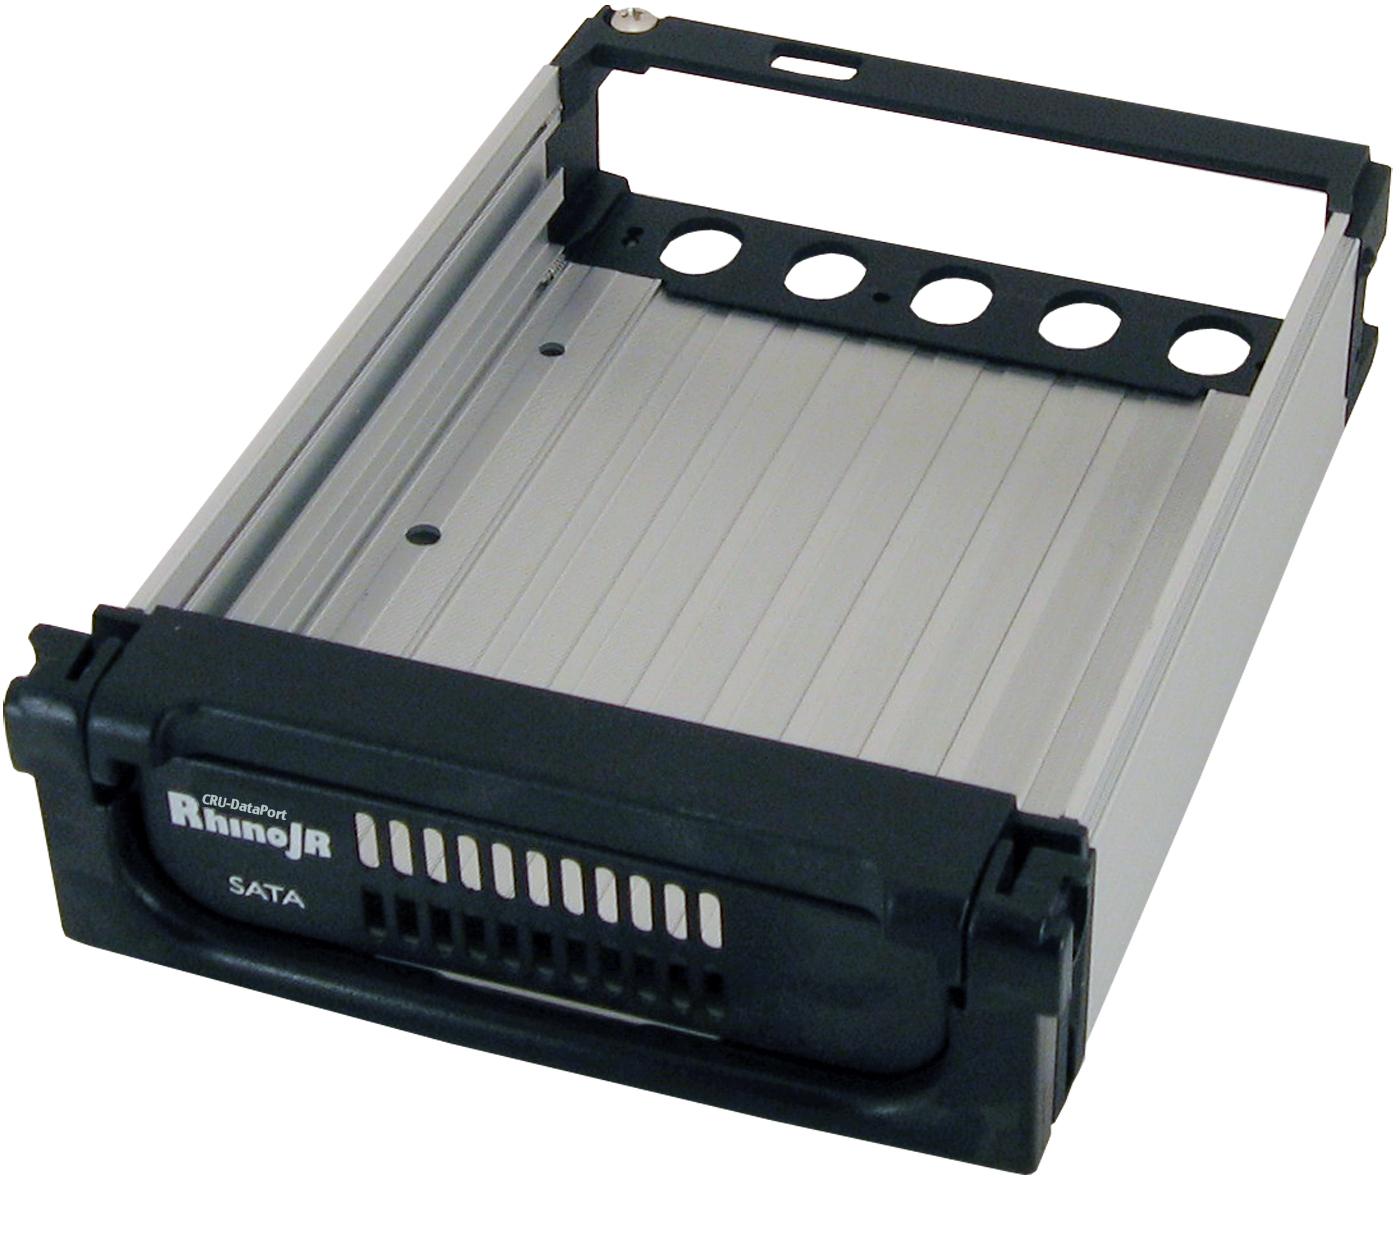 RhinoJR 110 SATA II Carrier - 1 x 3.5 inch - 1/3H Internal Hot-swappable - Internal - Black